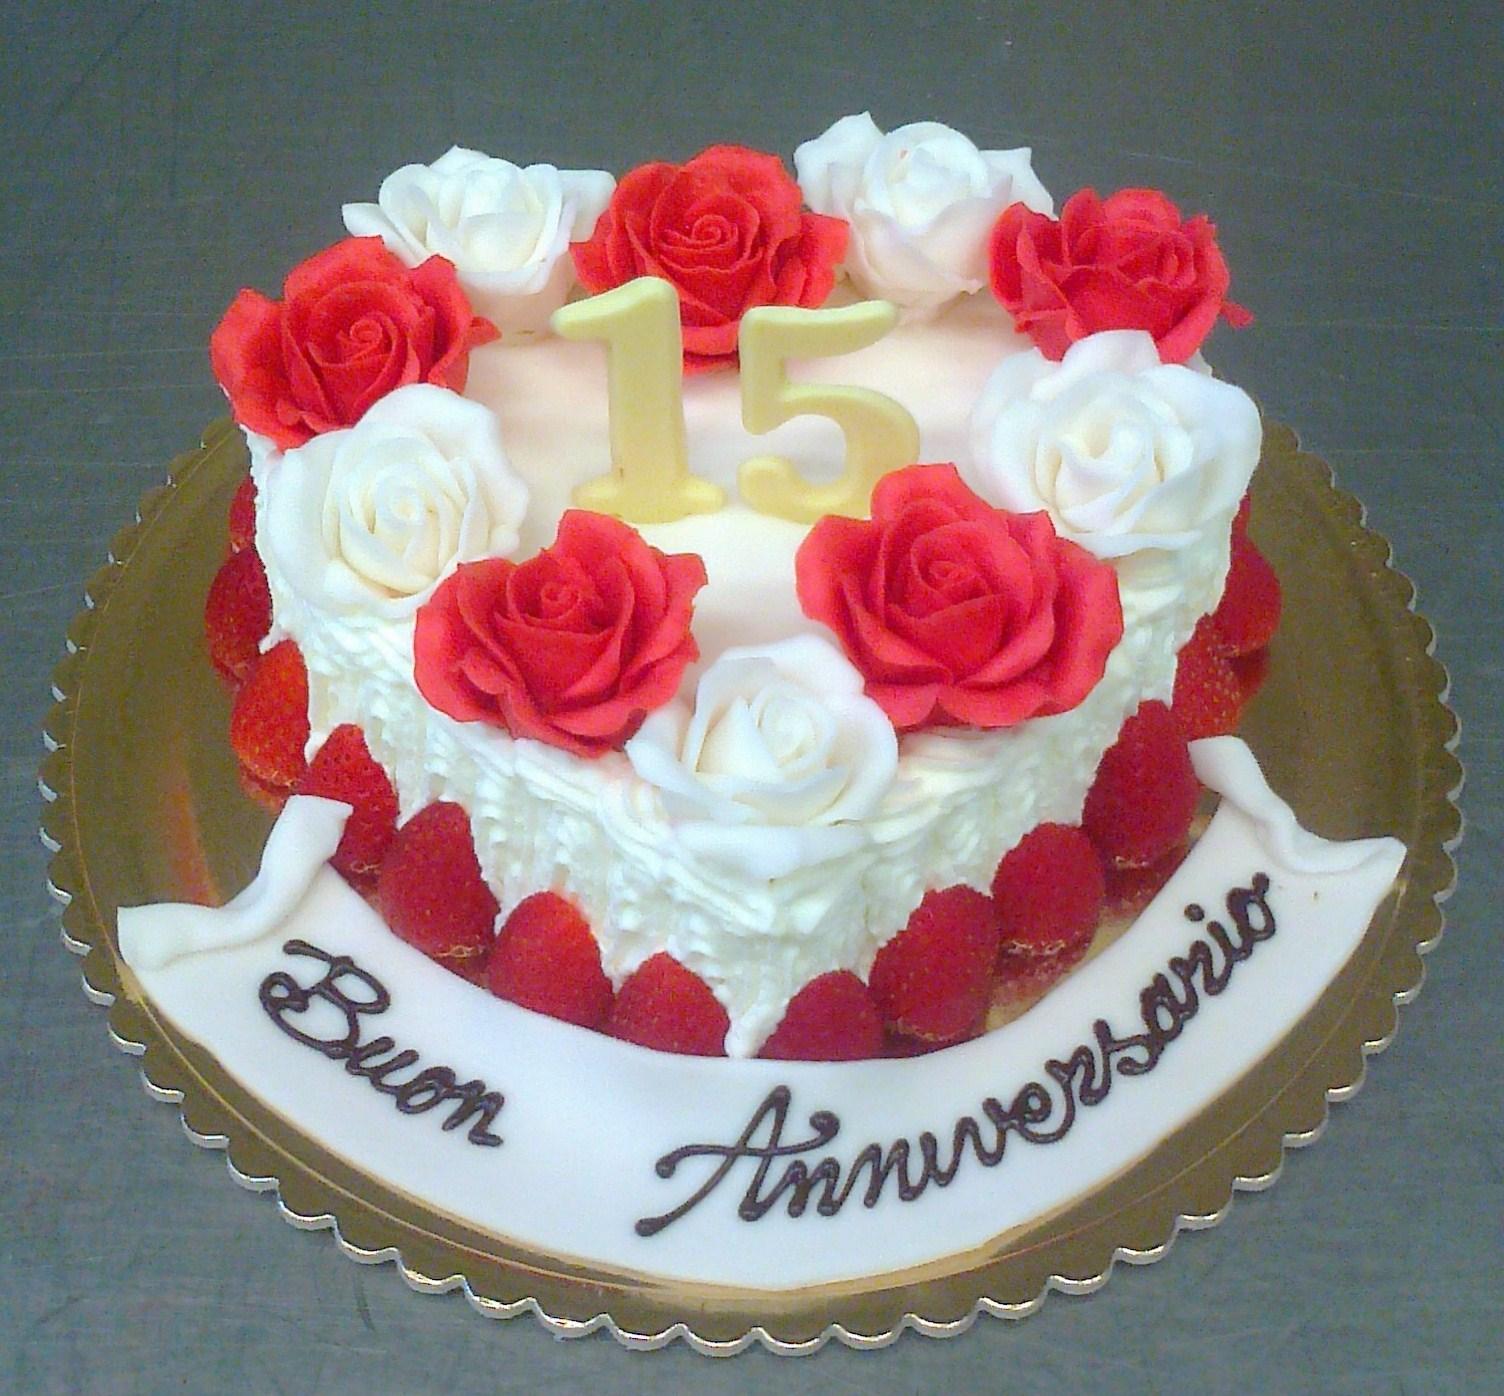 Auguri Primo Anniversario Matrimonio : Favoloso anniversario di matrimonio anni aw pineglen